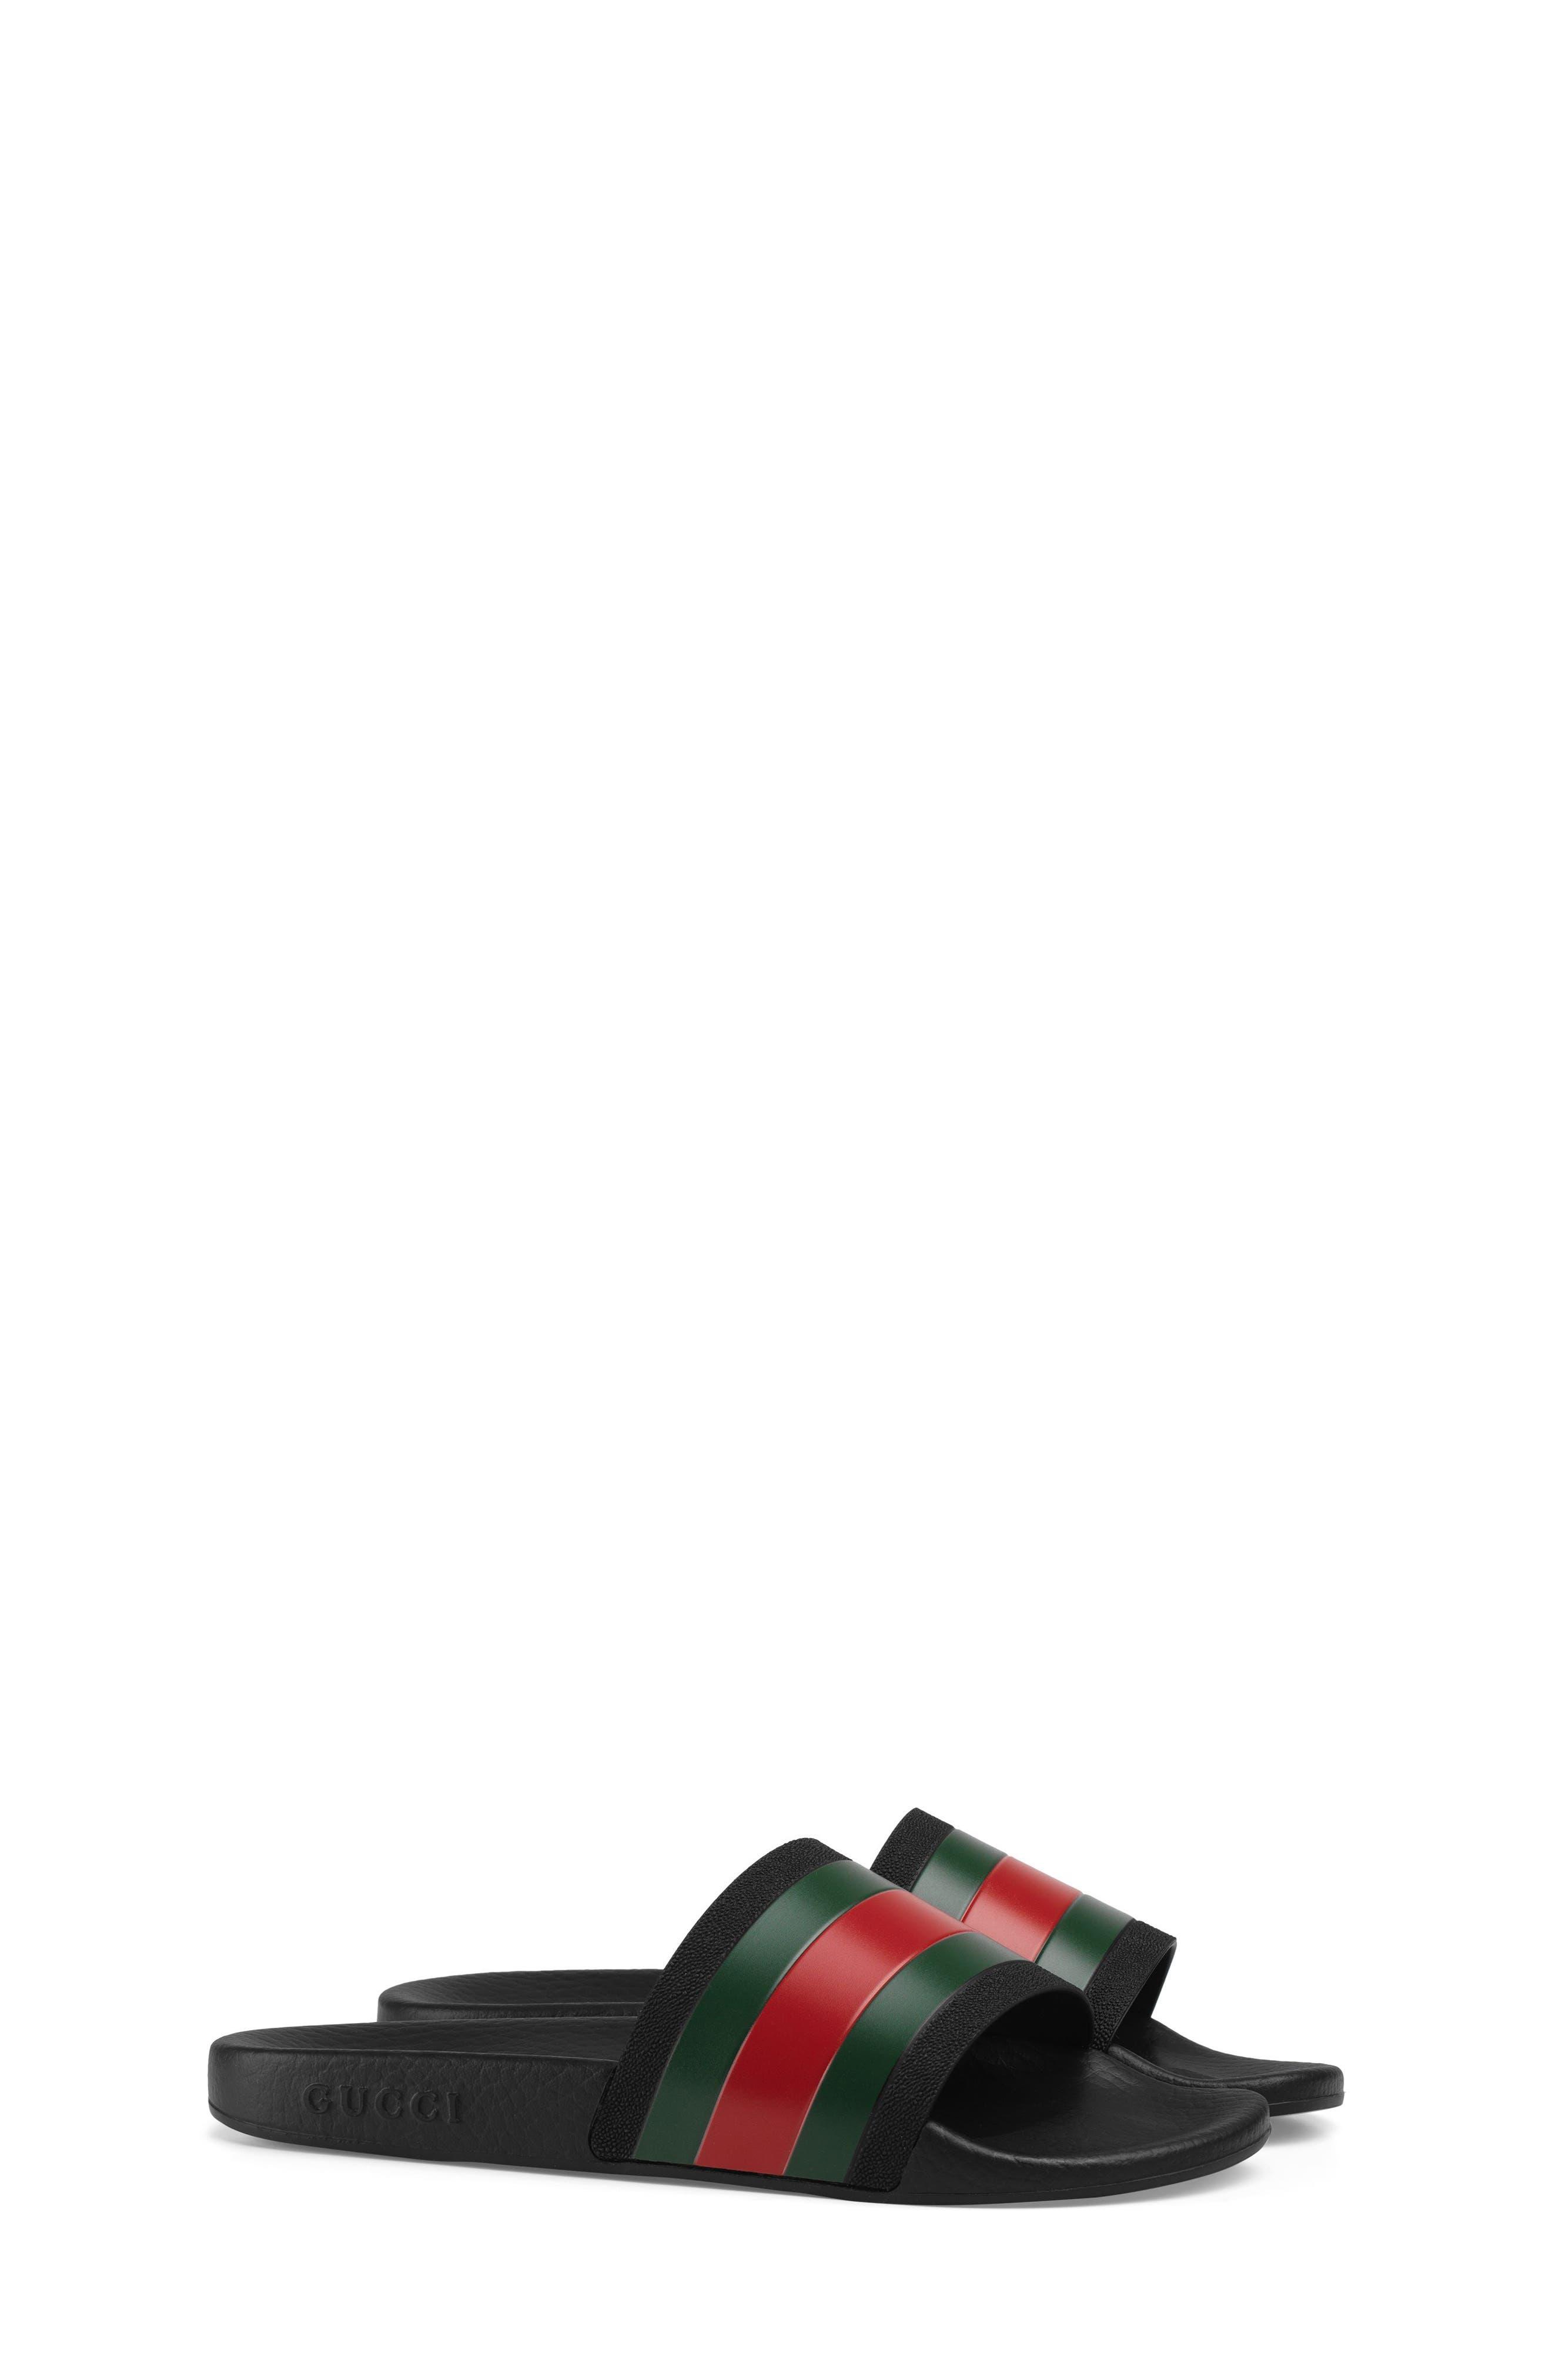 GUCCI, Pursuit Slide Sandal, Main thumbnail 1, color, BLACK/ GREEN/ RED